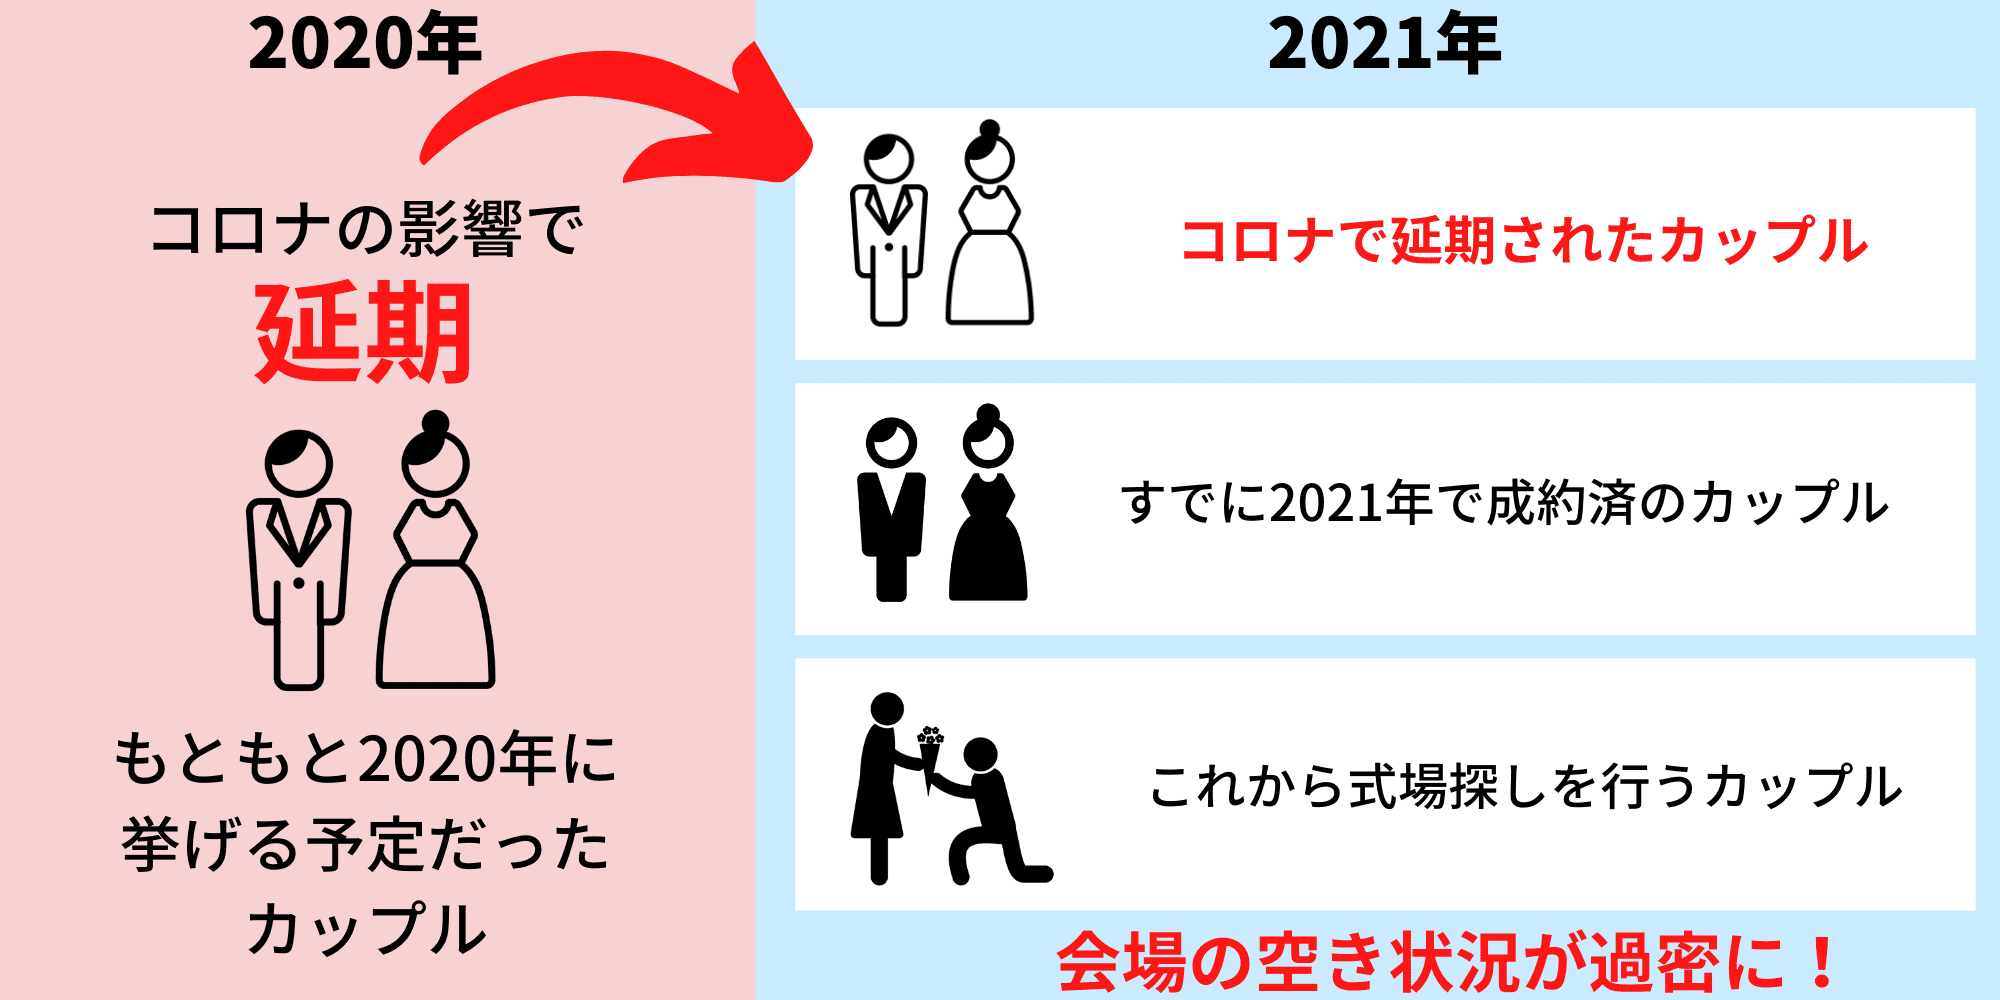 結婚式の延期動向